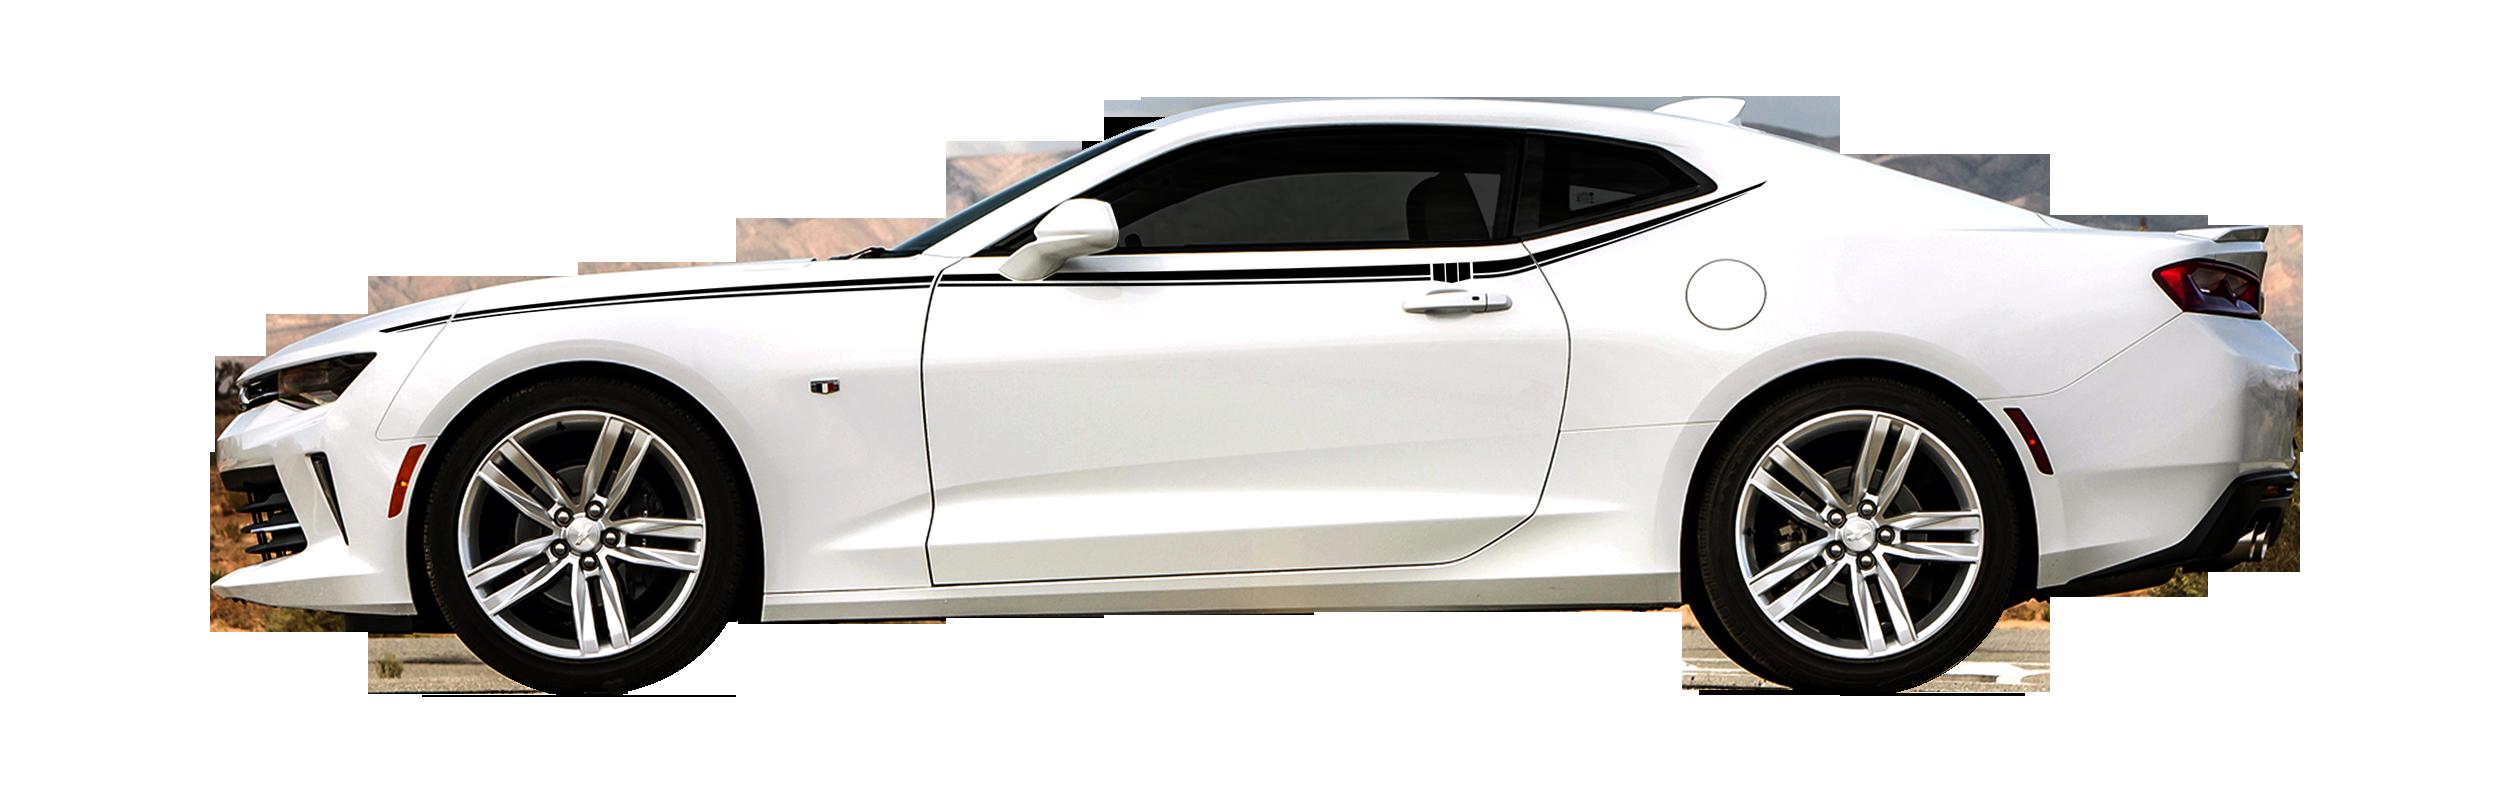 2016 - 2018 Camaro CC MUSCLE™ BODY SPEAR KIT